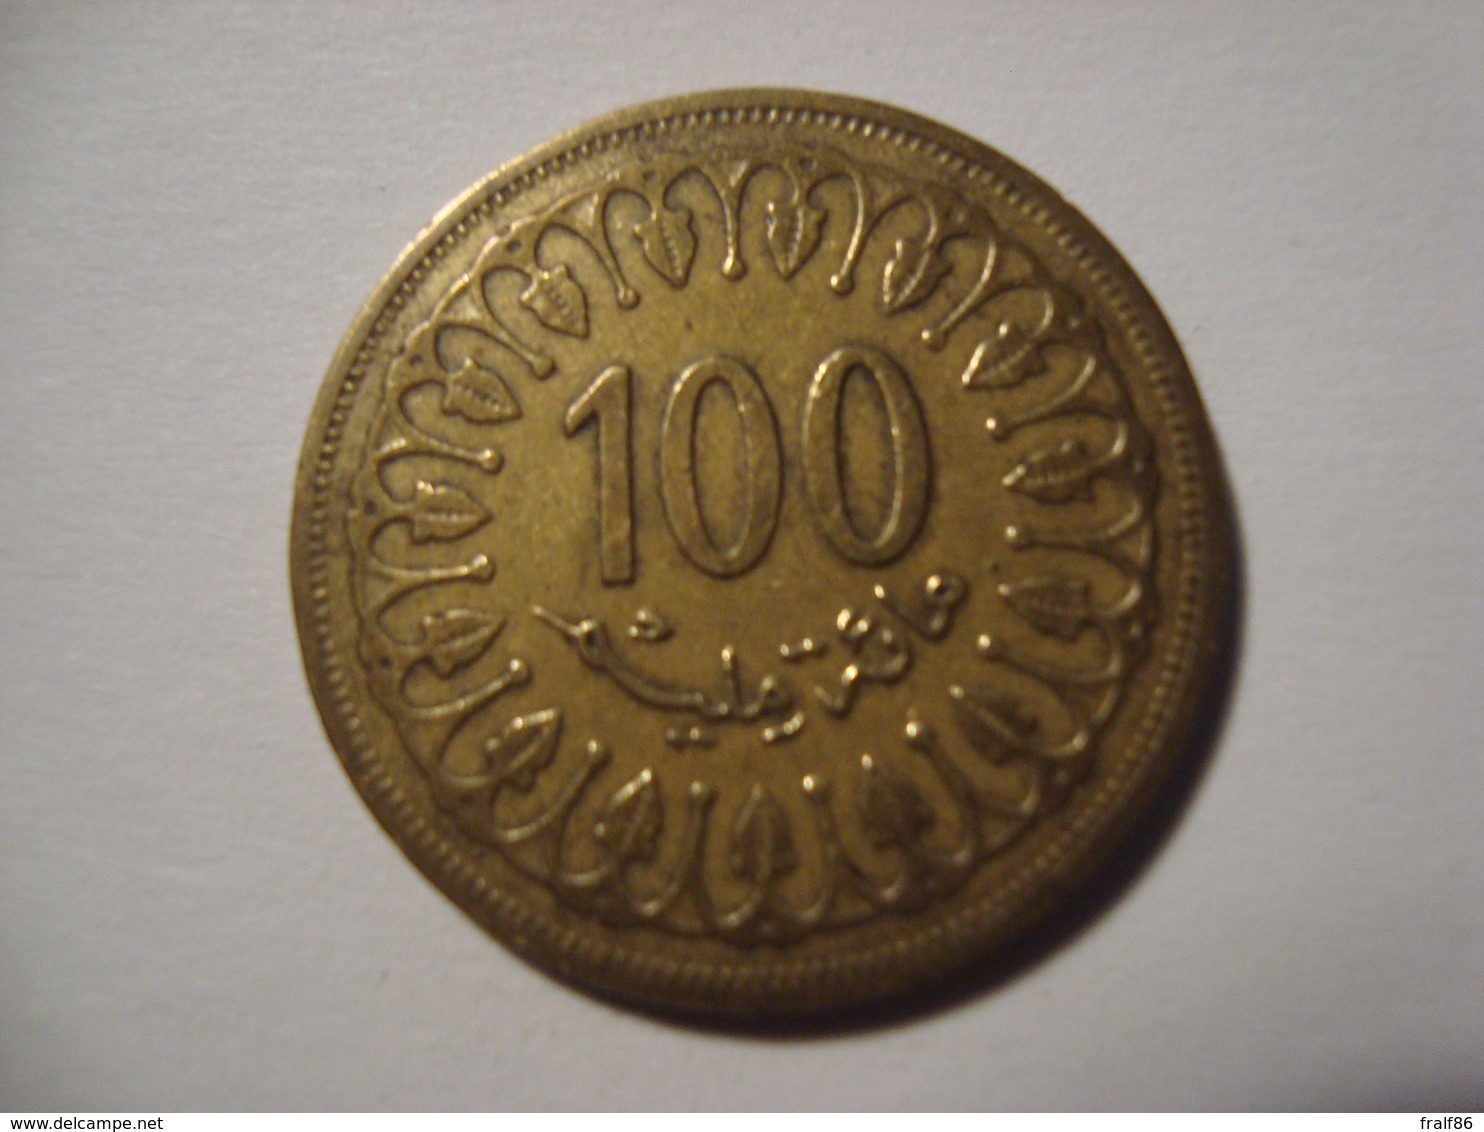 MONNAIE TUNISIE 100 MILLIMES 1996 / 1416 - Tunisia